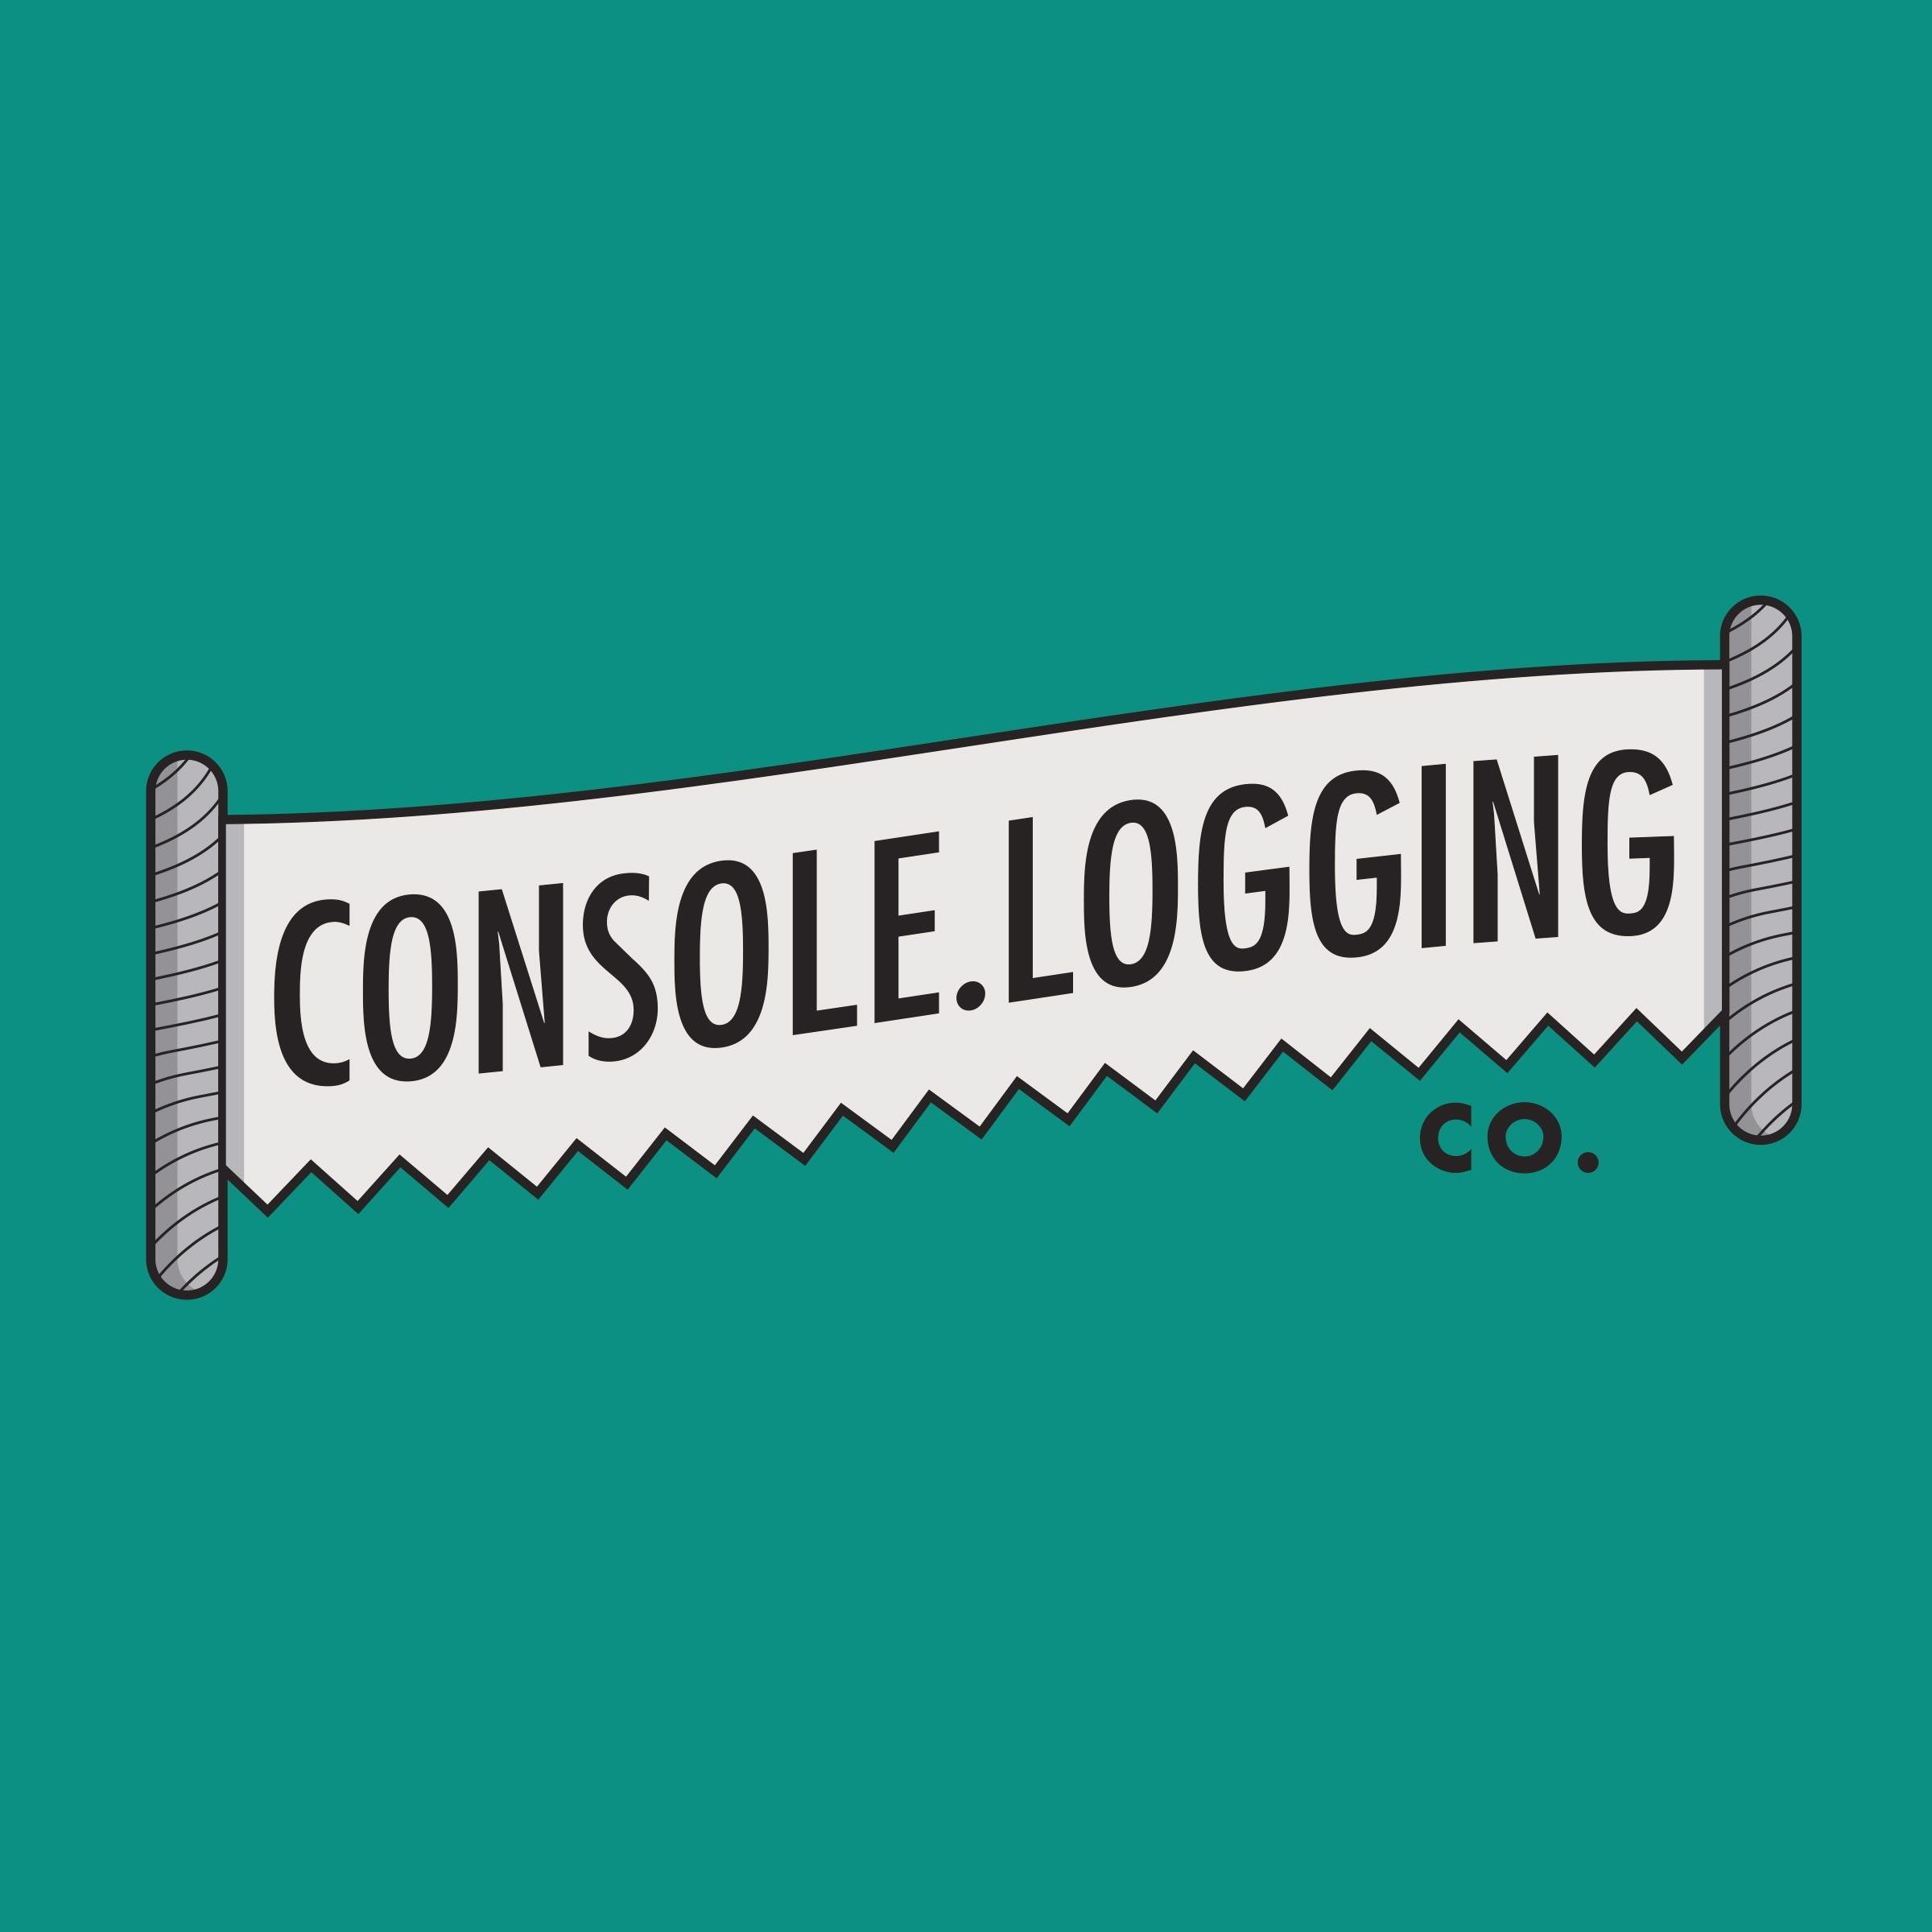 Console.Logging Detail